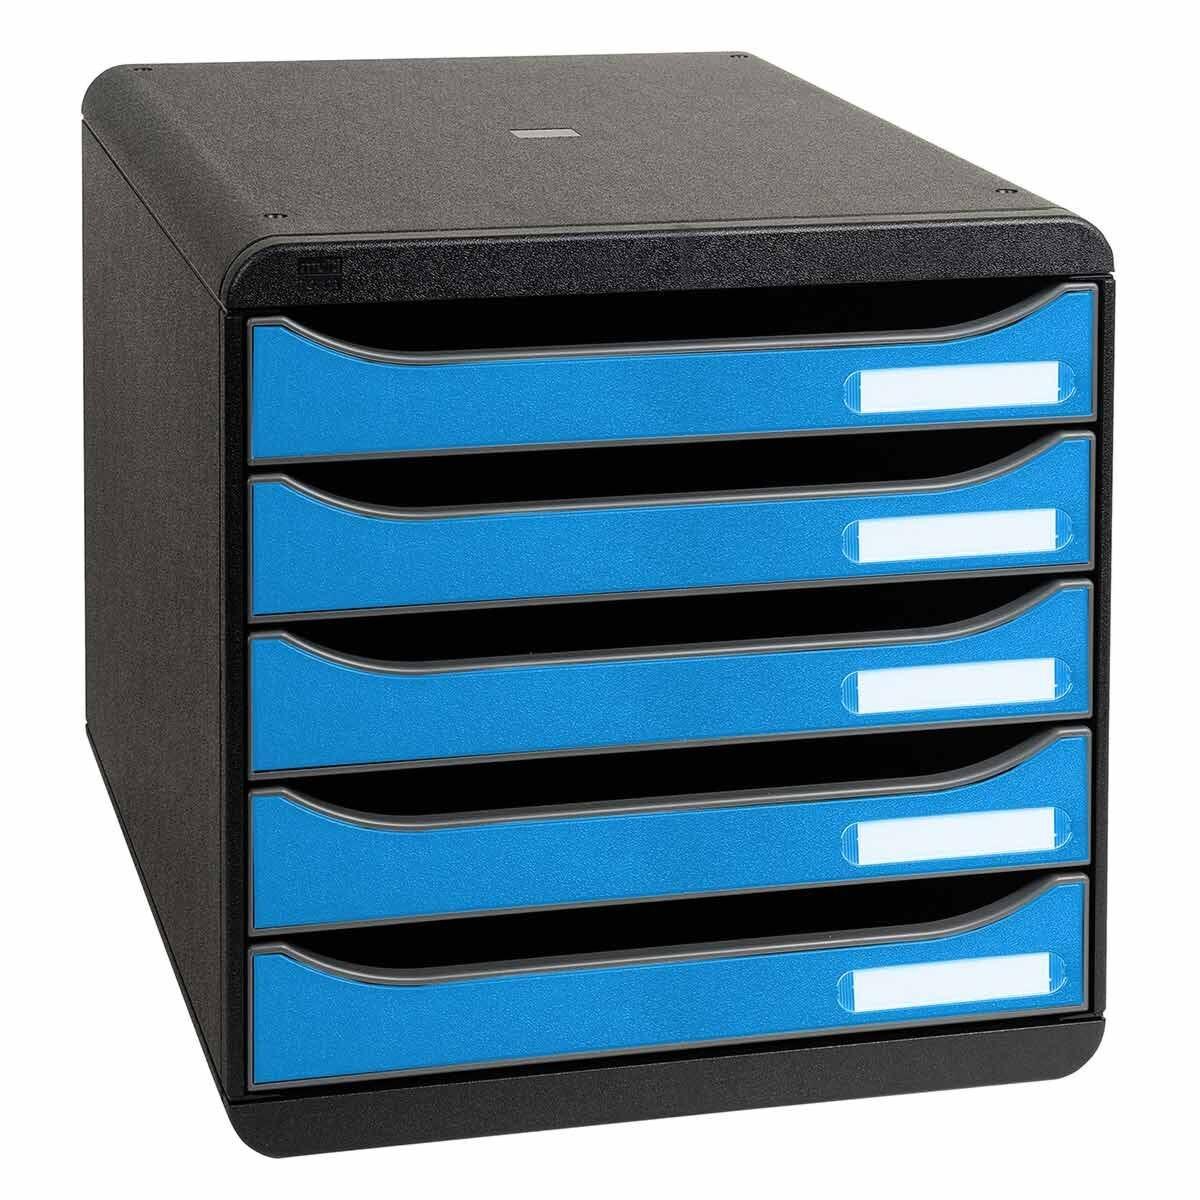 Exacompta Clean Safe Big Box Plus 5 Drawers